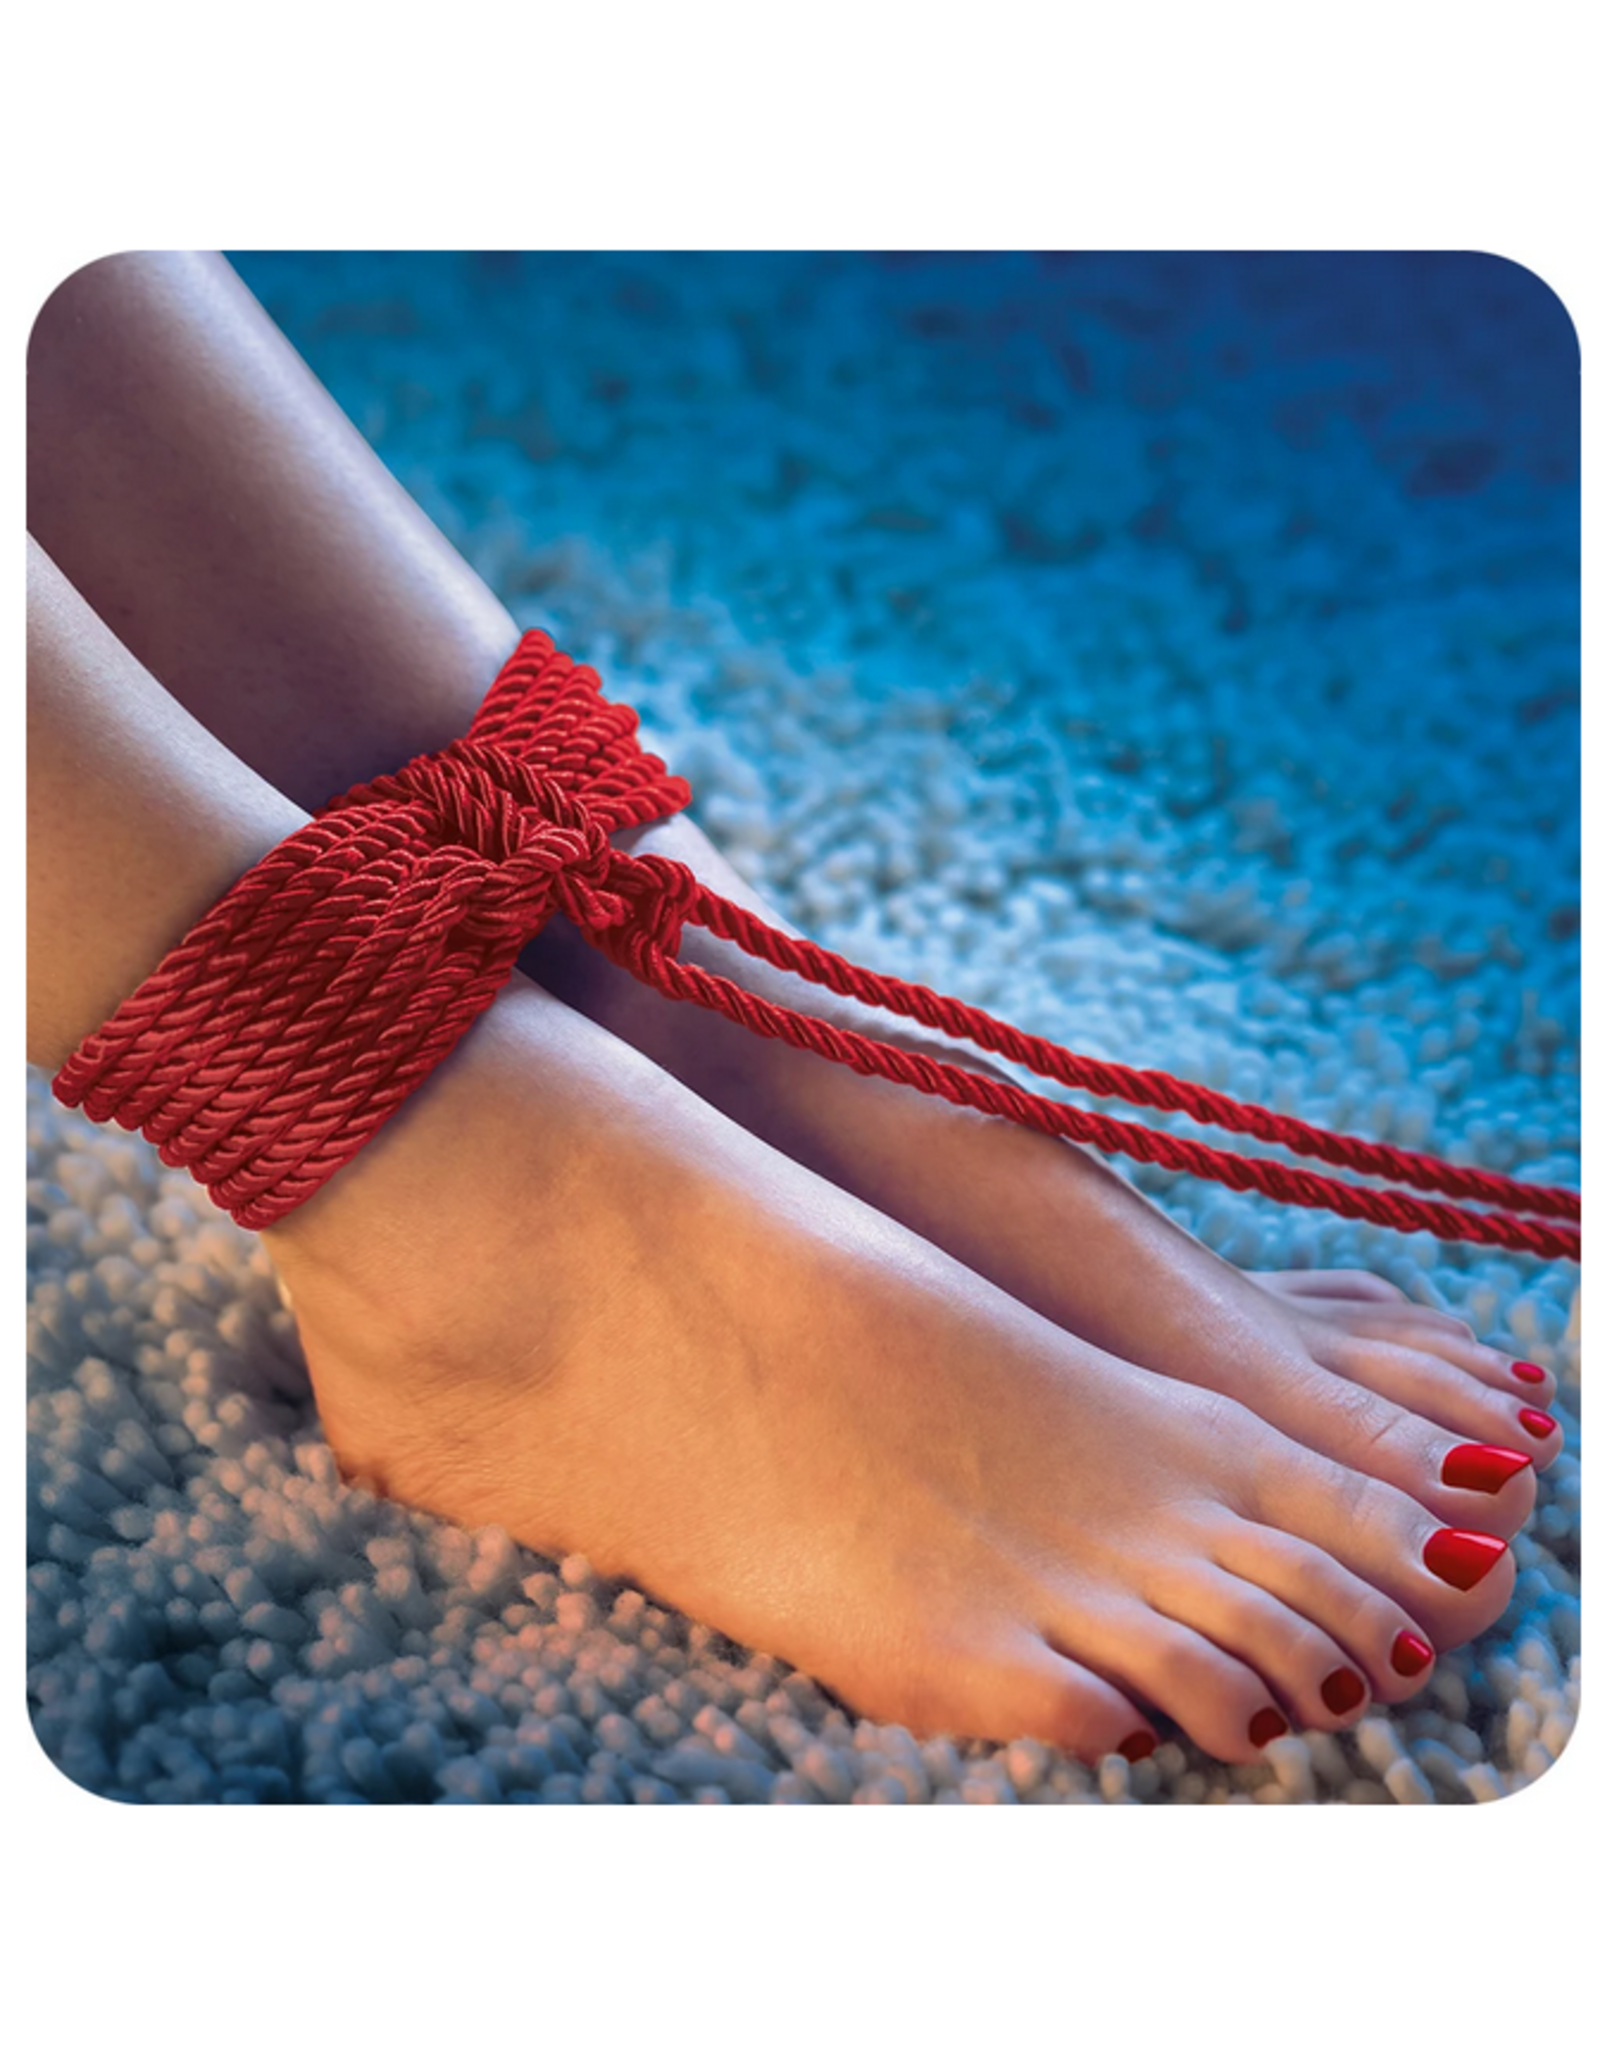 Scandal Scandal BDSM Rope 32.5'/10m in Red